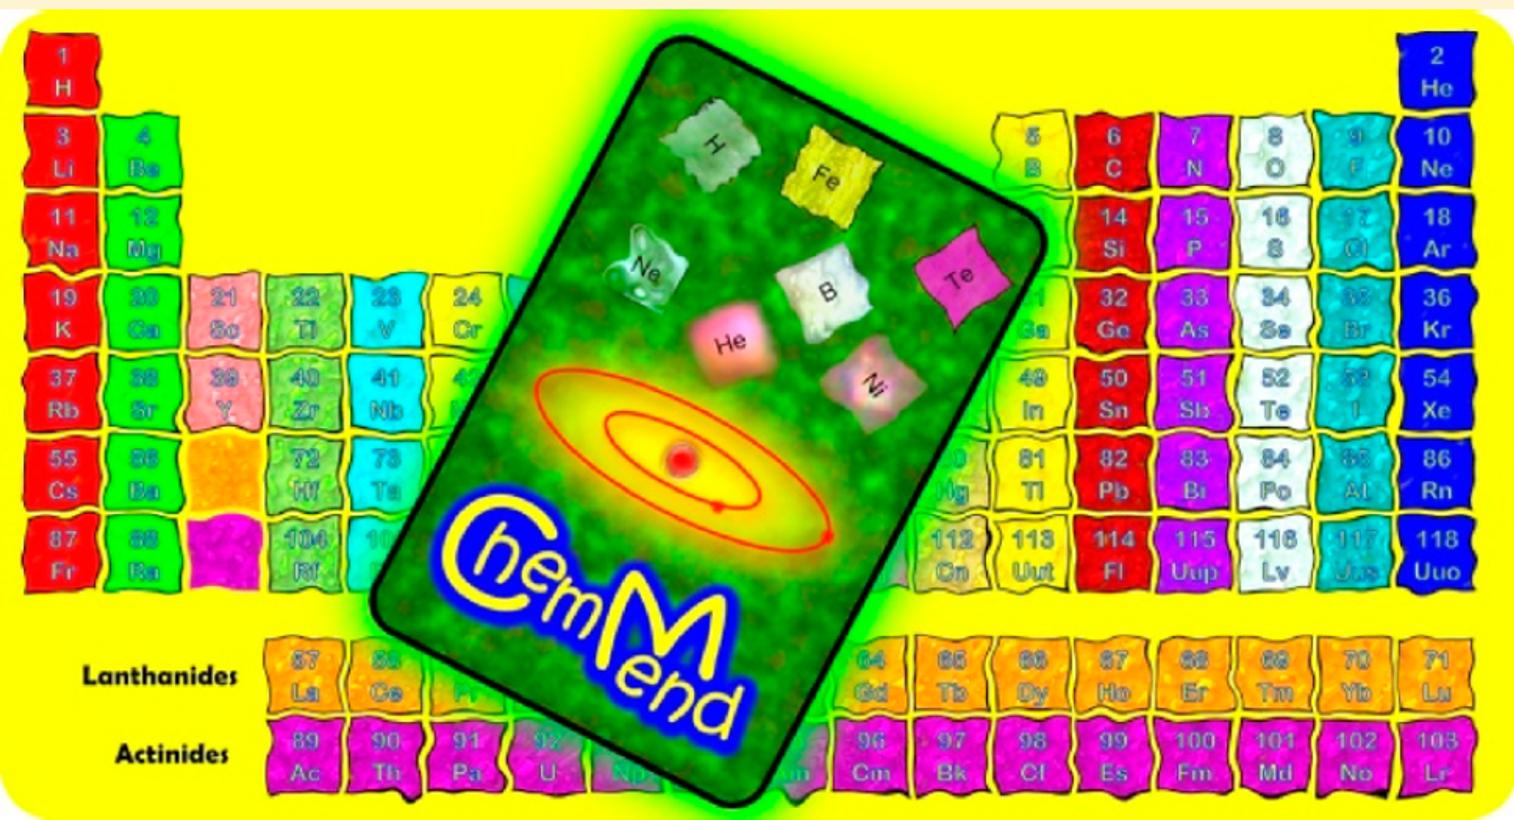 Aprender a ensear qumica chemmend introduce y explora la tabla chemmend introduce y explora la tabla peridica en el aula urtaz Gallery